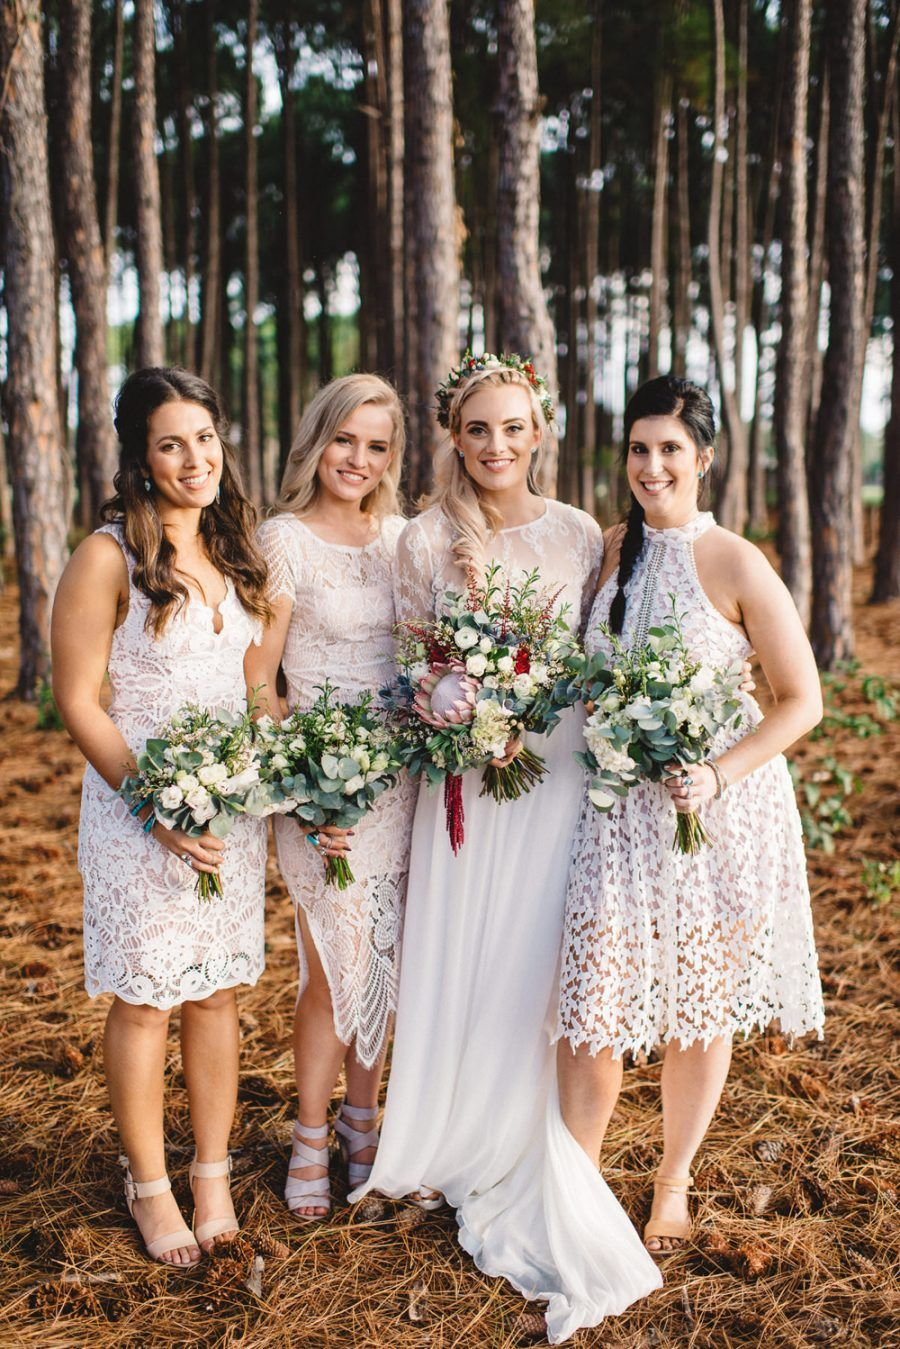 Bridesmaids in mixed white dresses bridesmaids pinterest